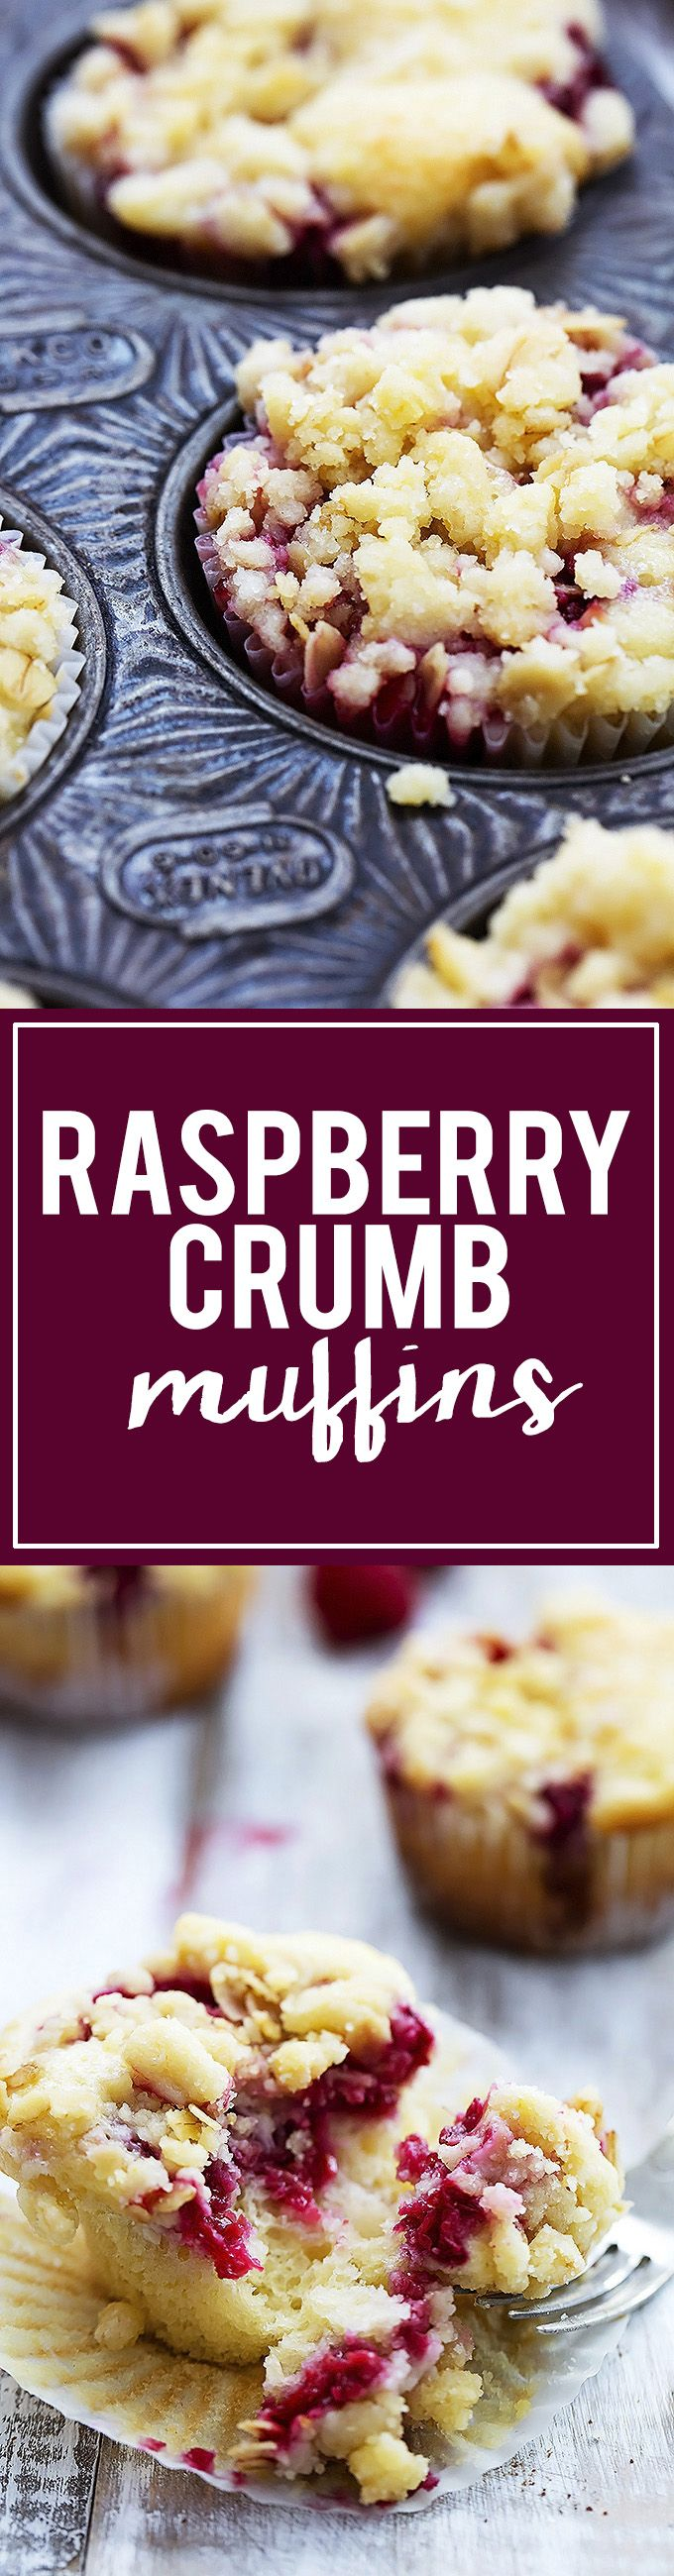 Raspberry Crumb Muffins | Creme de la Crumb #TheBeautyAddict